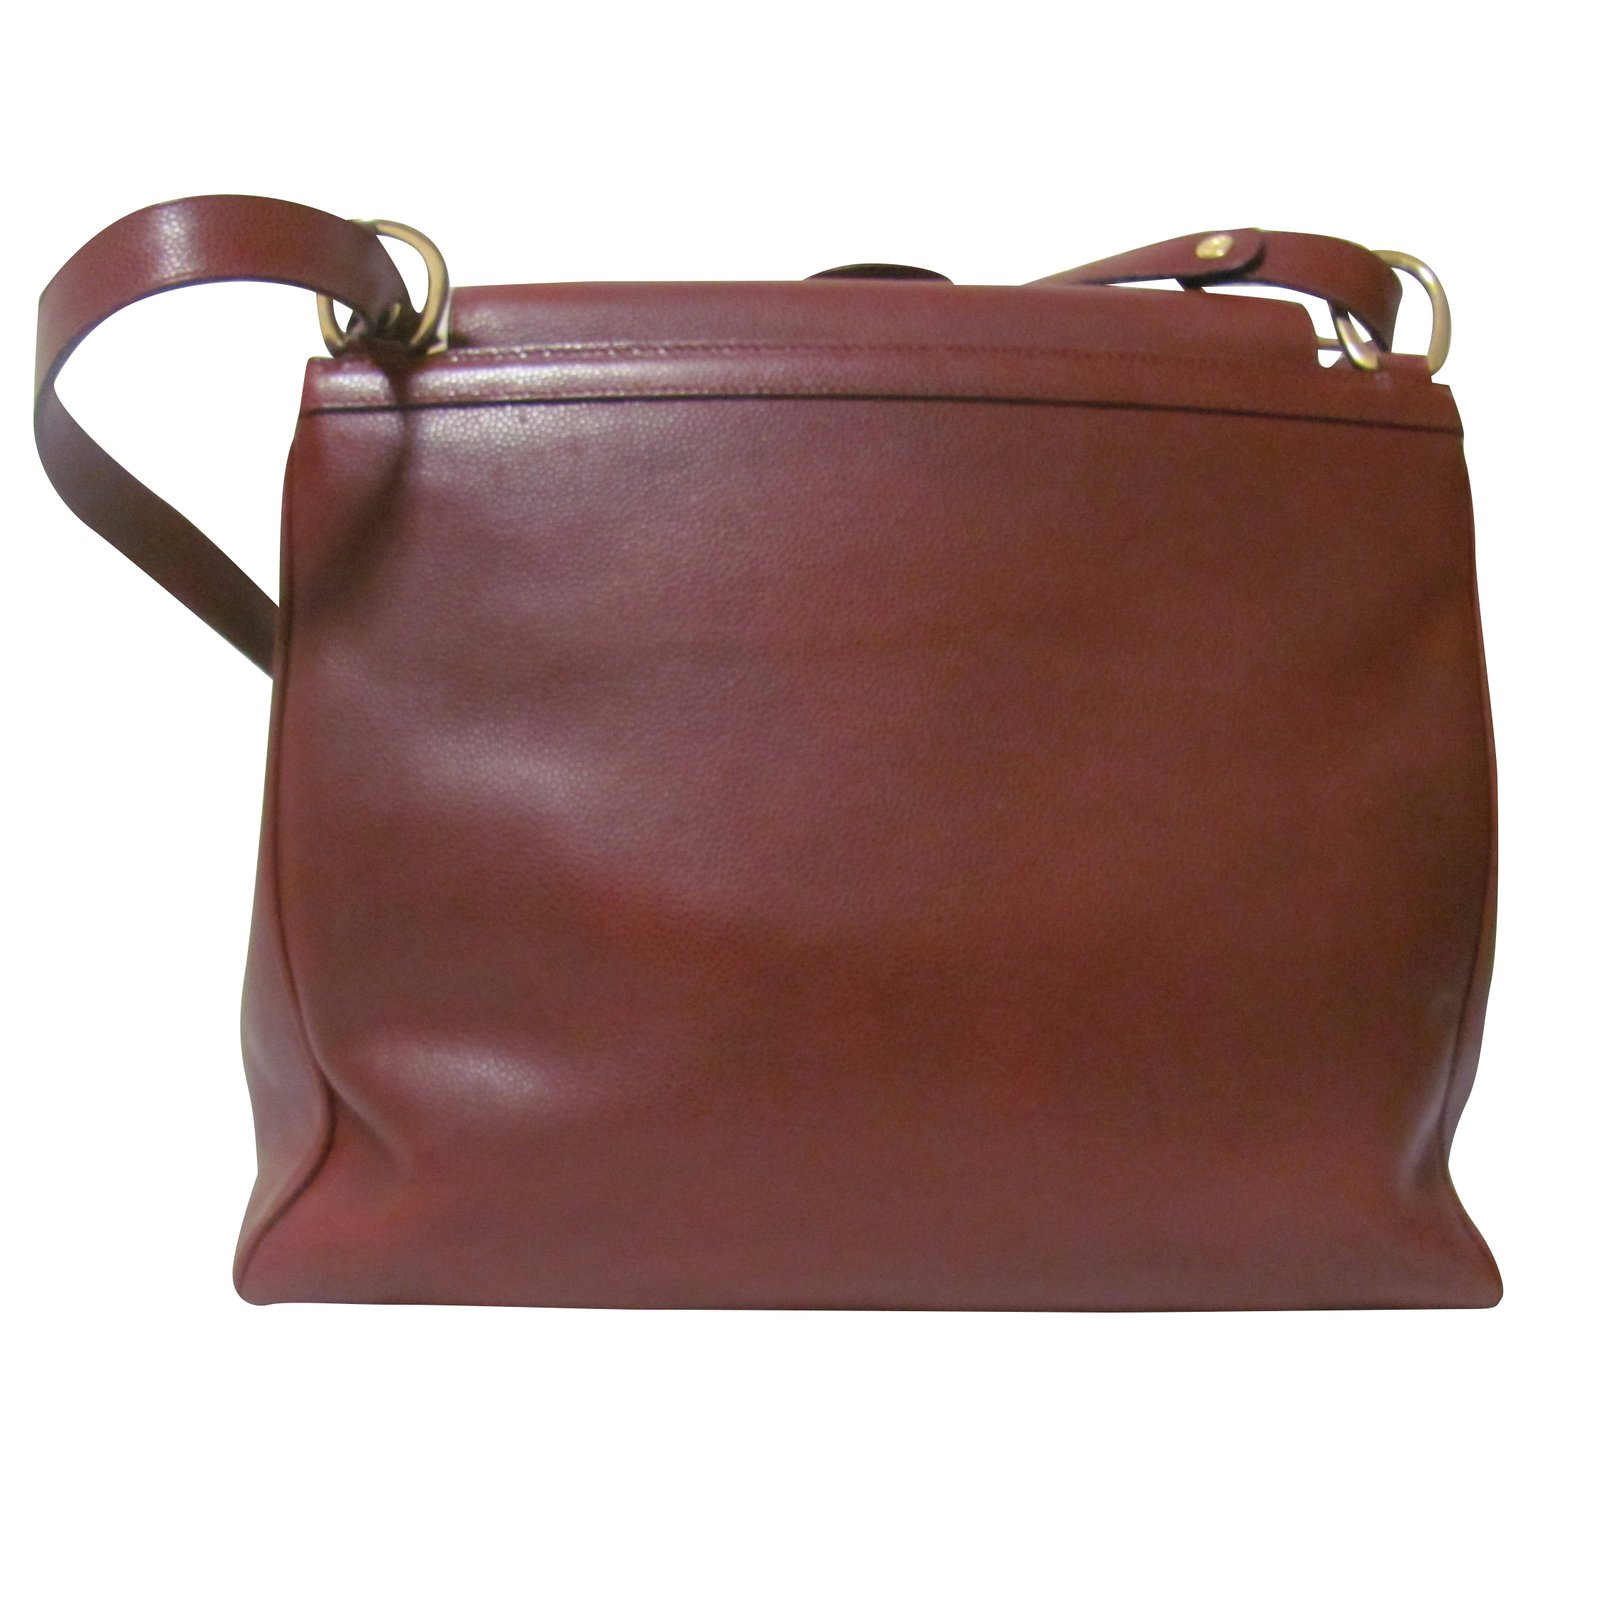 Nina Ricci Handbag Handbags Leather Dark Red Caramel Ref 28520 Joli Closet